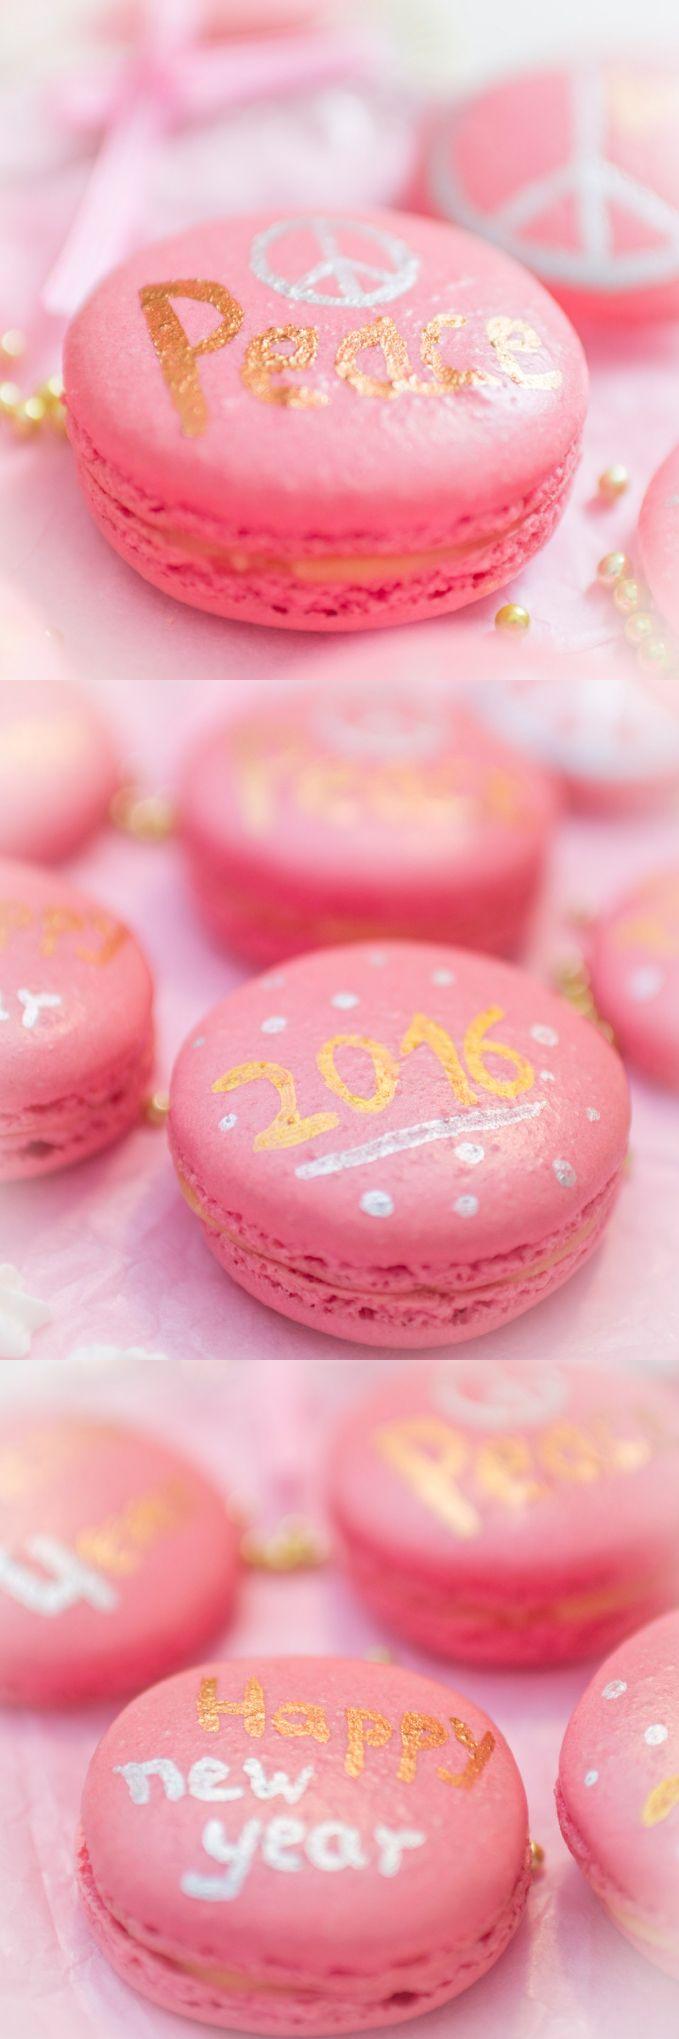 frau zuckerfee rezept f r gelingsichere macarons macaron macaroon meringue pinterest. Black Bedroom Furniture Sets. Home Design Ideas